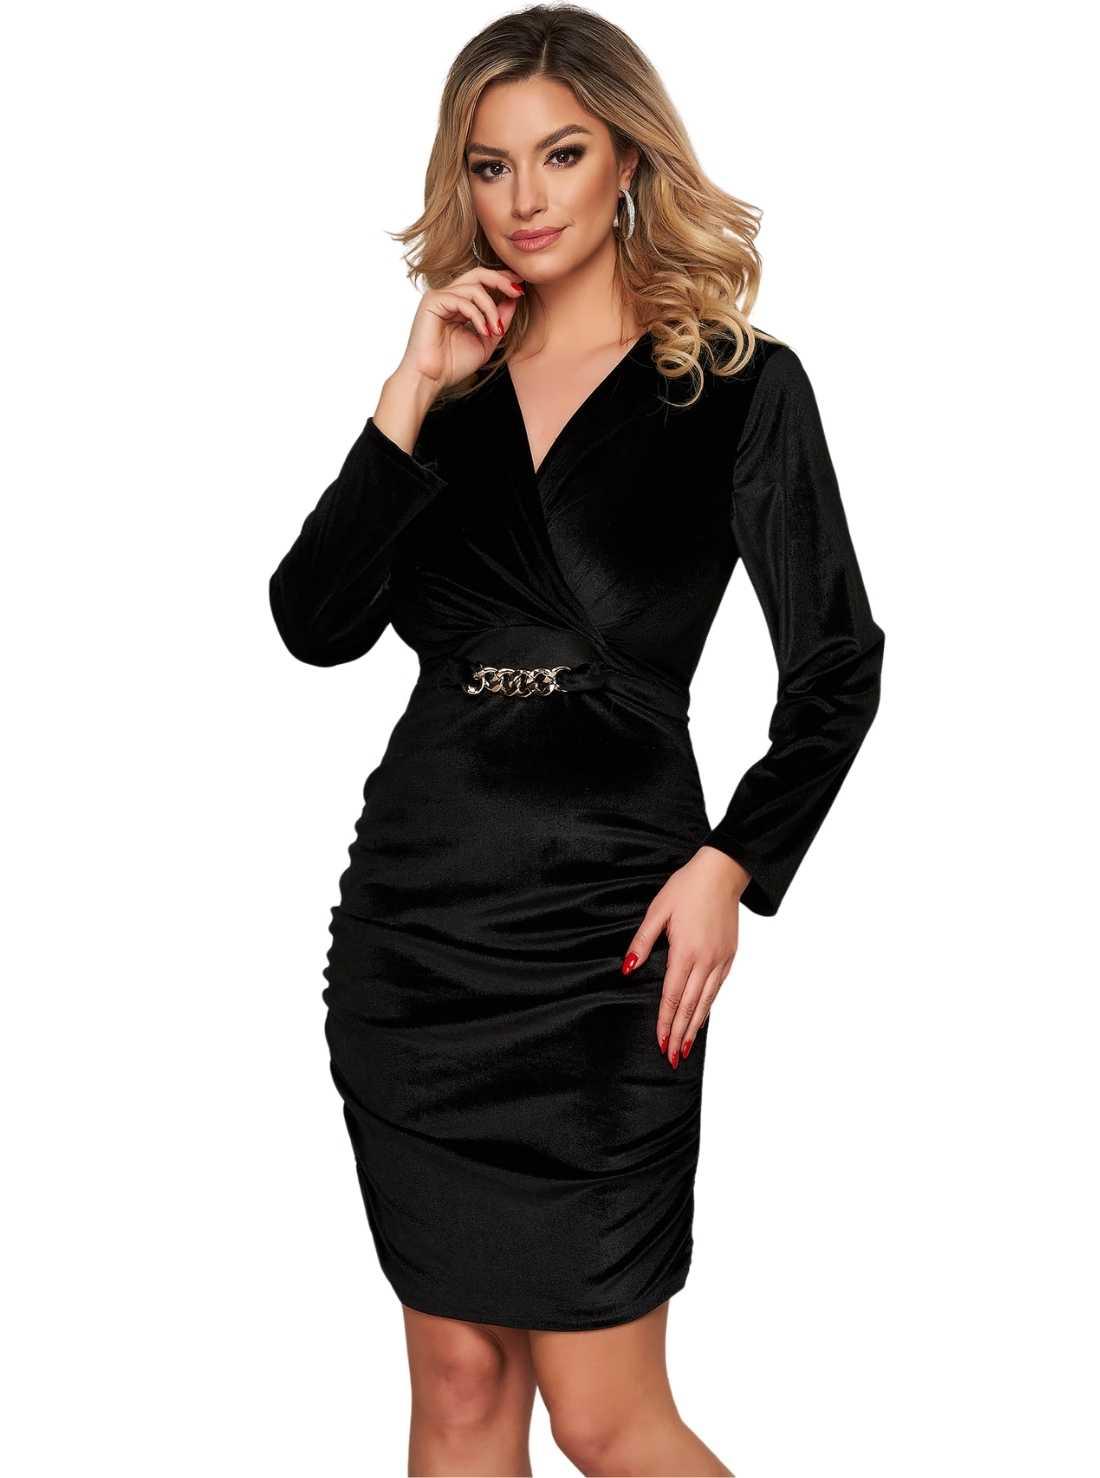 Black dress velvet occasional wrapover front metallic accessory